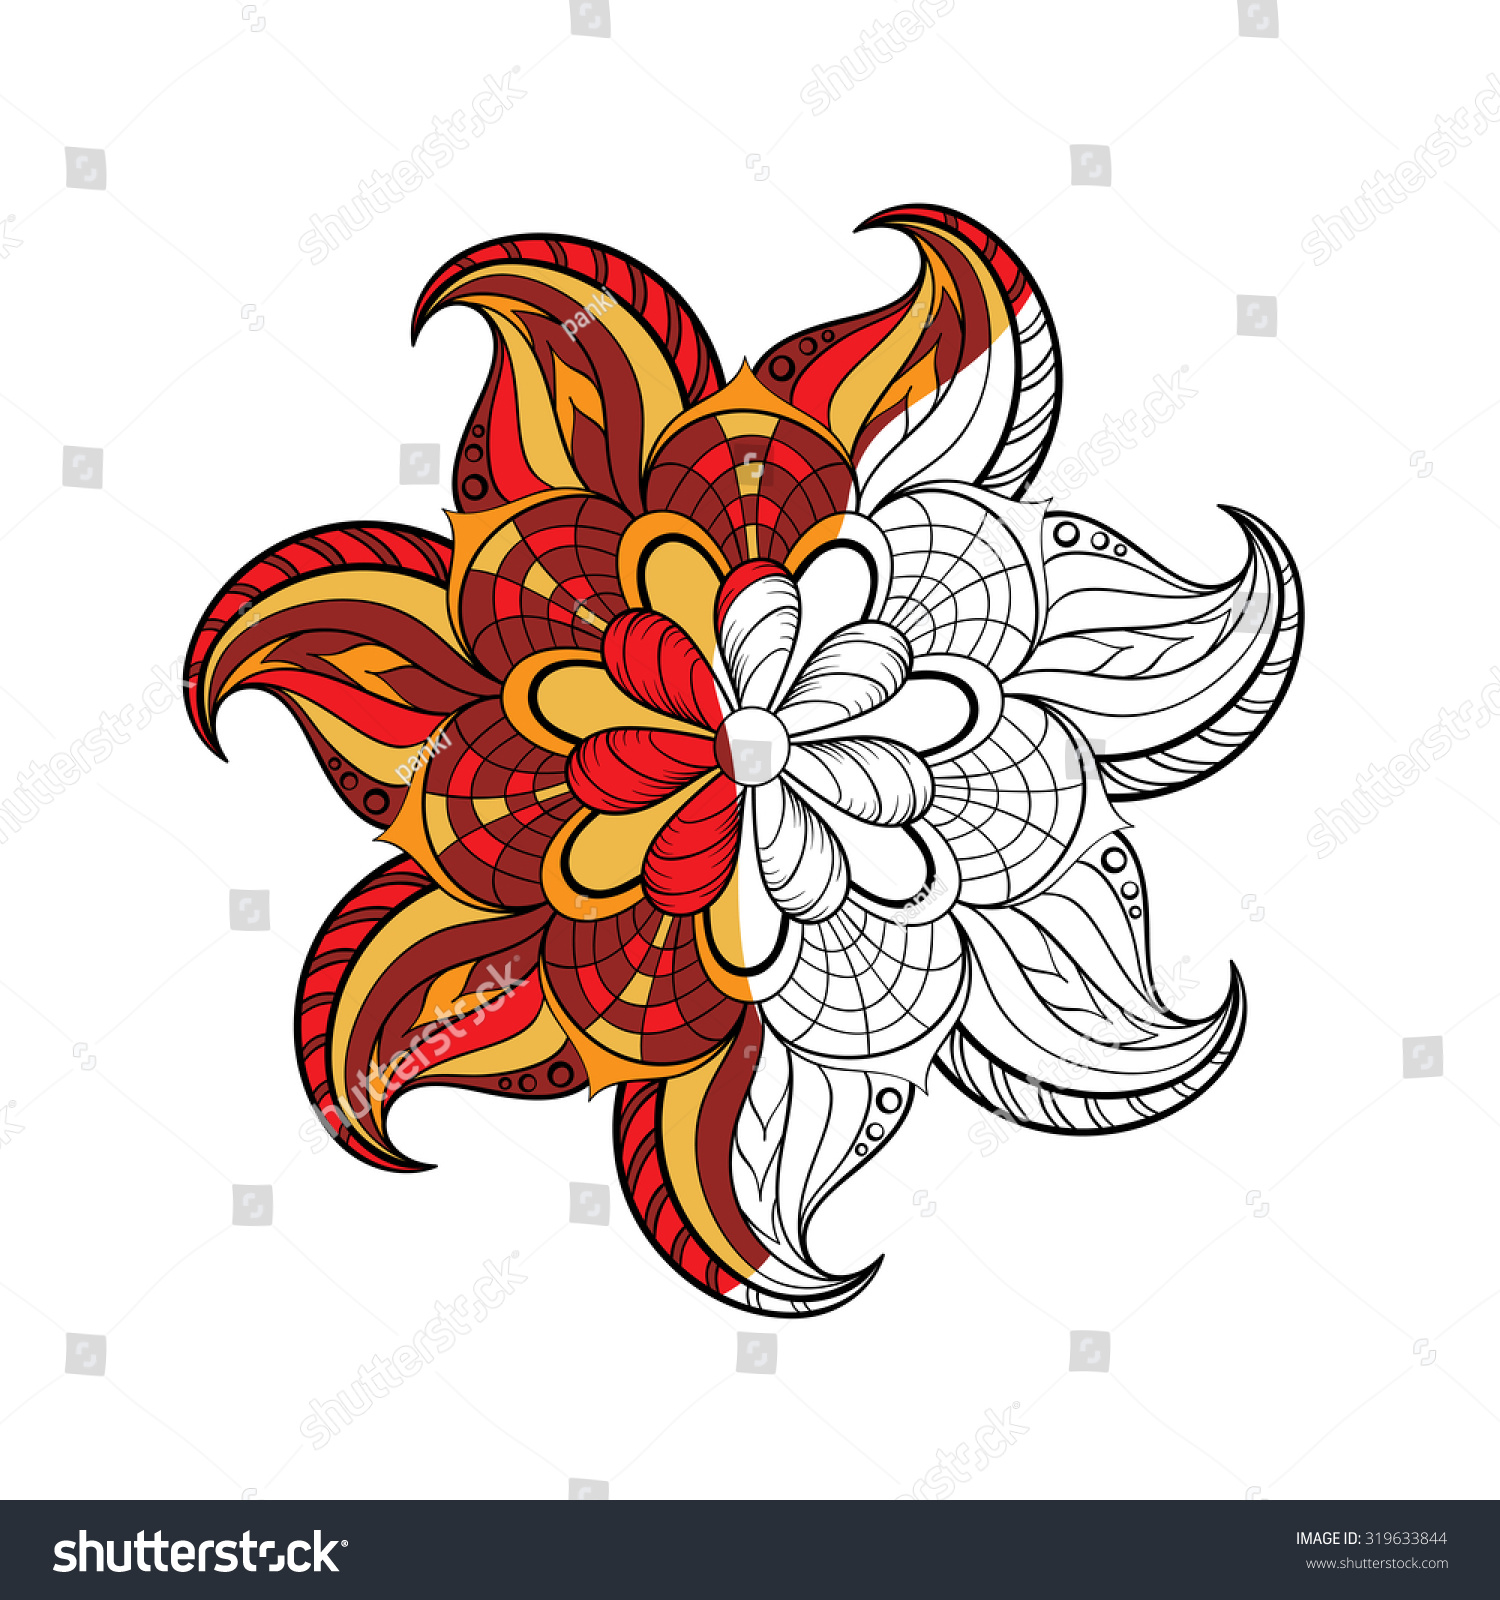 Zentangle Stylized Arabic Indian Round Mandala Stock Vector ...